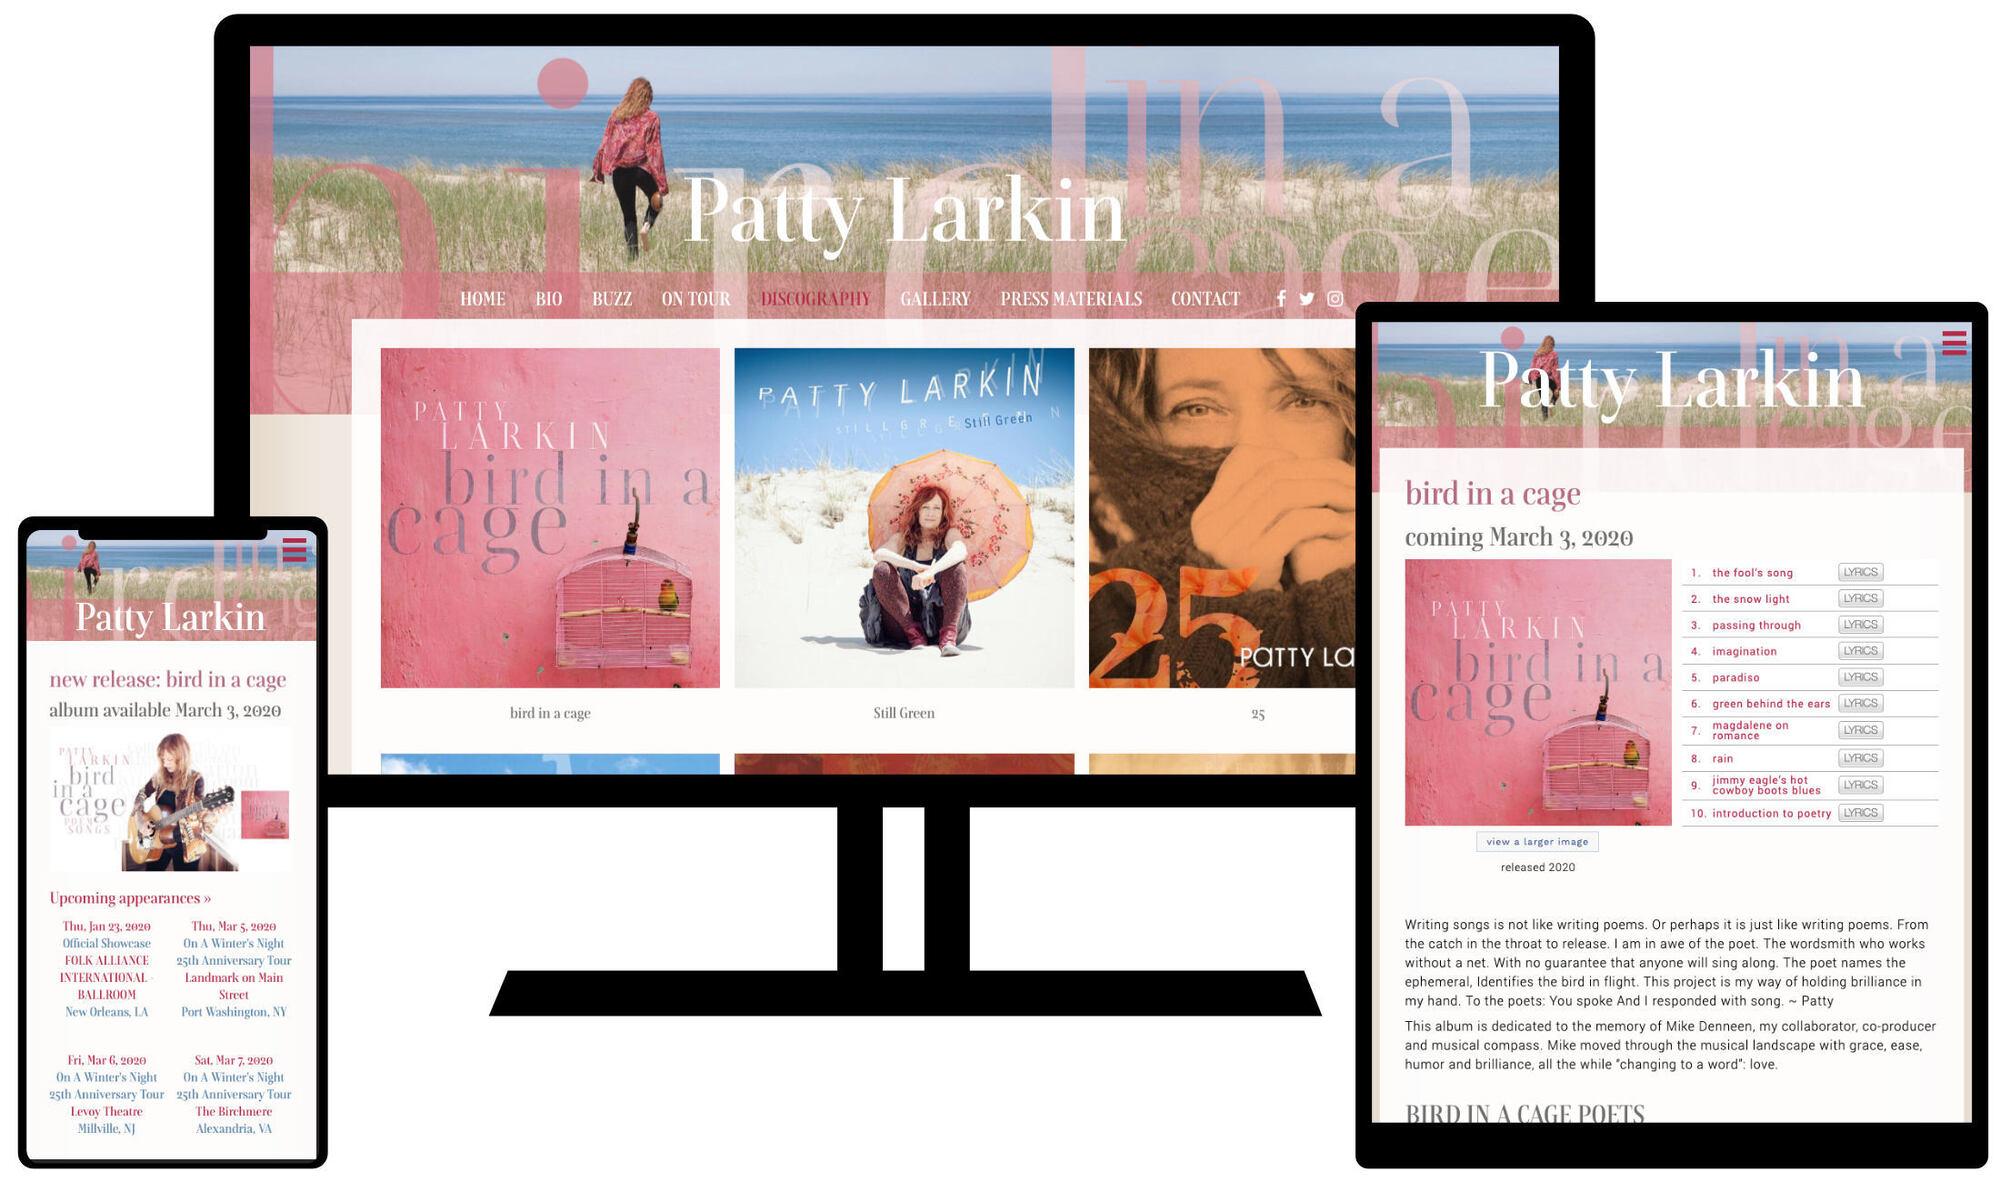 Patty Larkin's Website on desktop, tablet, and phone